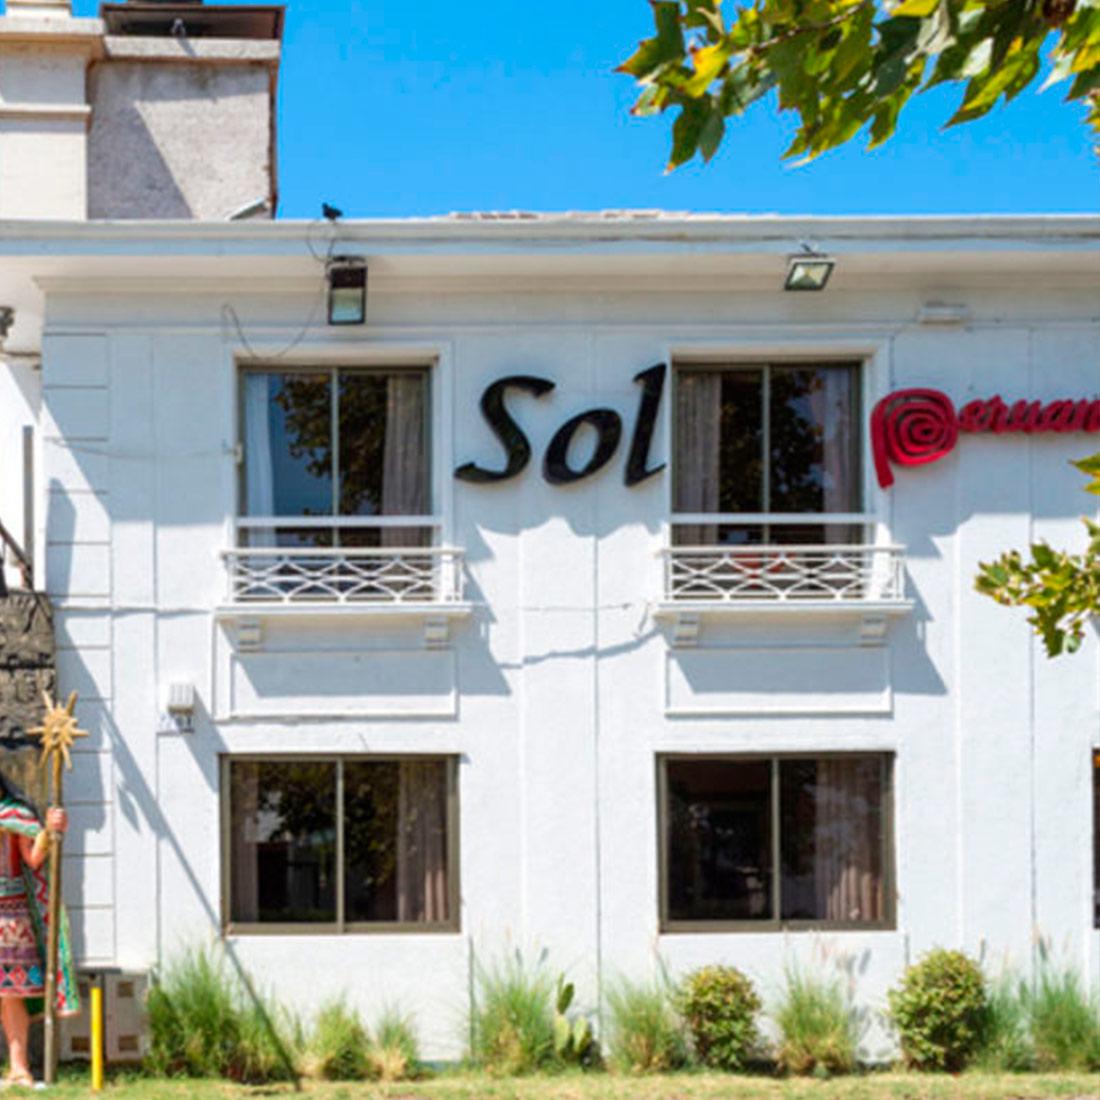 SOL RESTAURANT Restaurante - Reserva en restaurantes de Comida PERUANA - PROVIDENCIA - MESA 24/7 | SANTIAGO - Perú